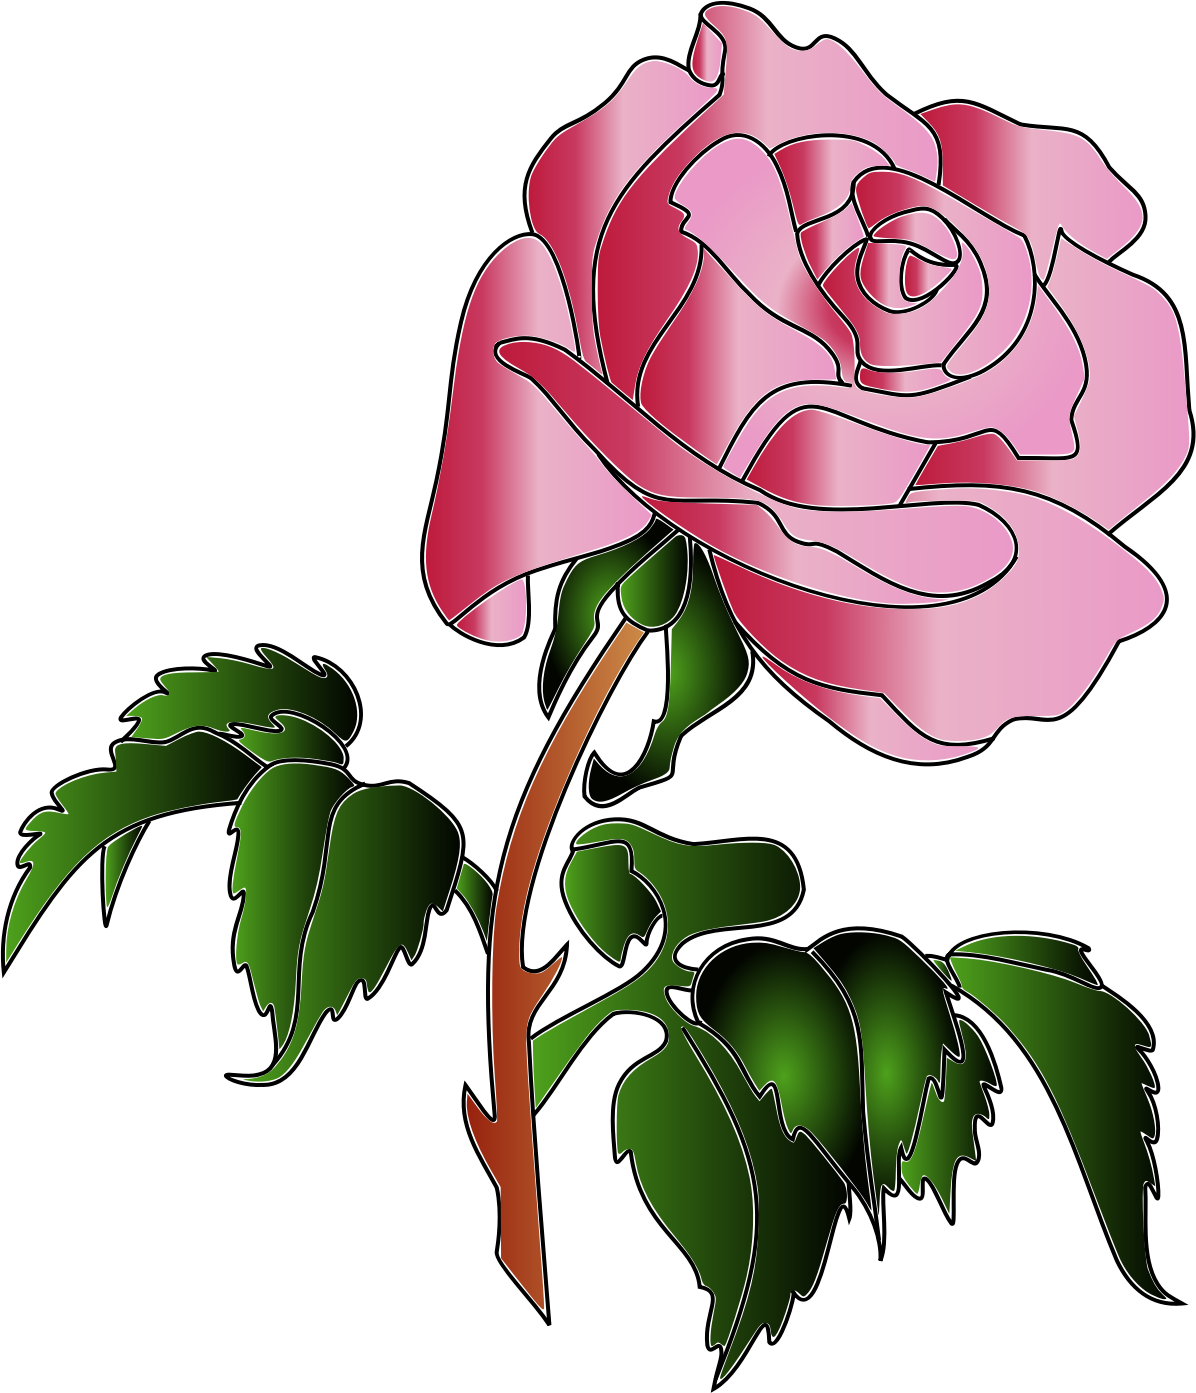 Colors big image png. Color clipart rose